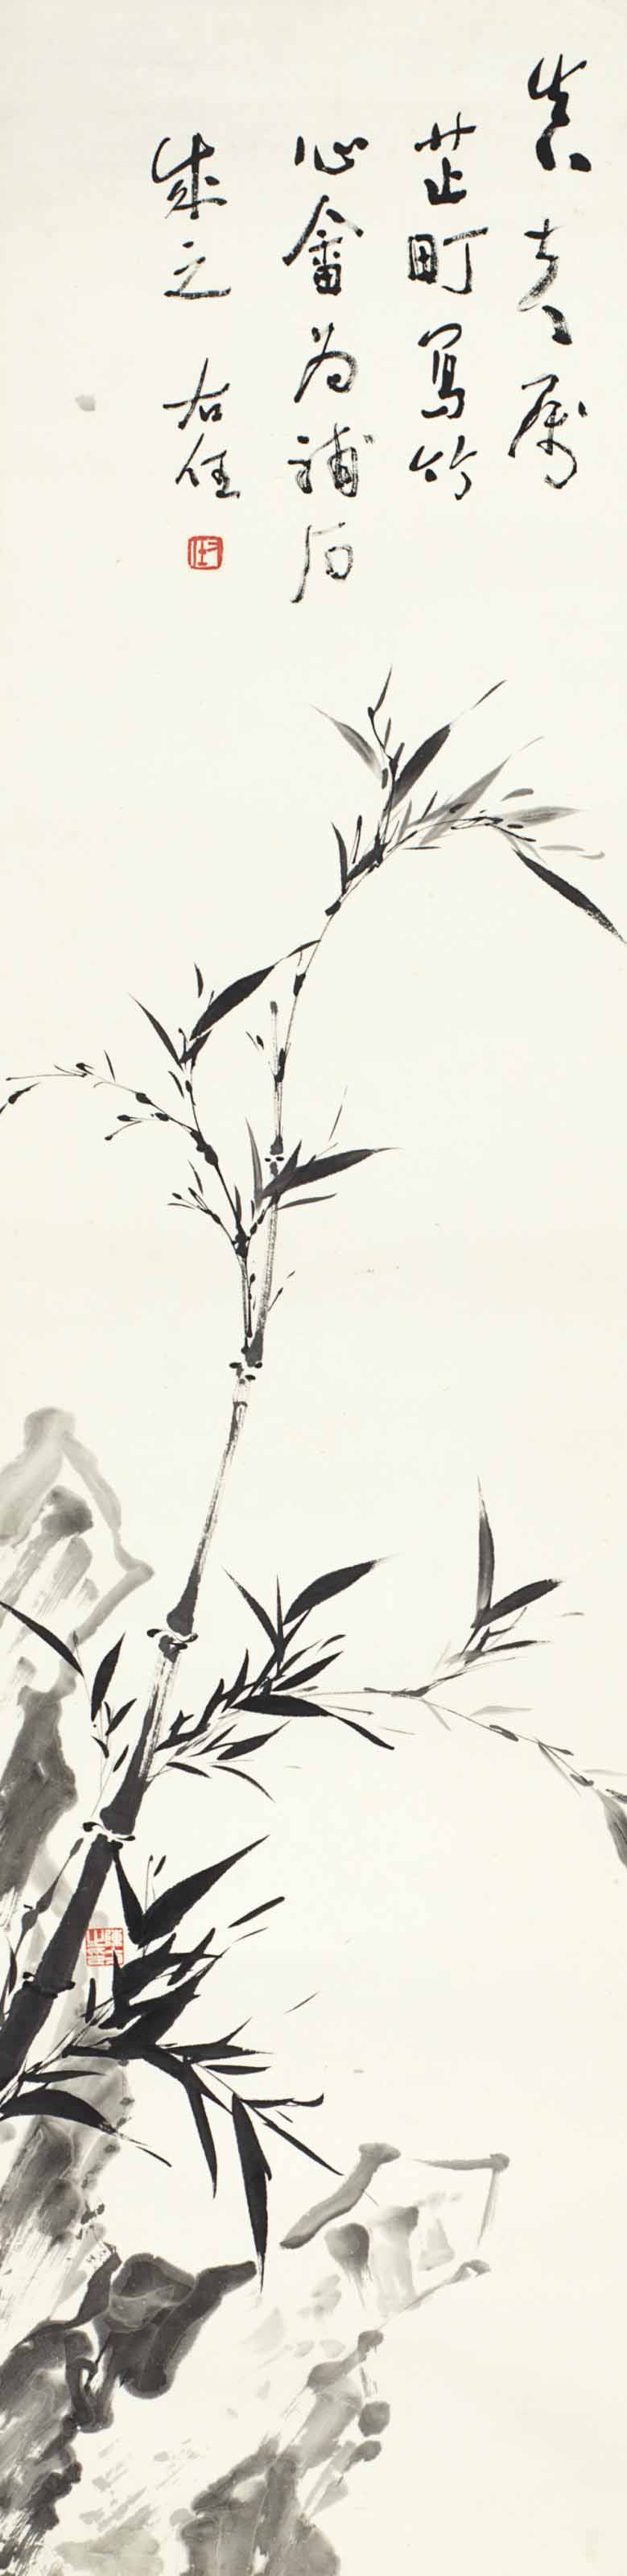 PU RU (1896-1963) AND CHEN FAN